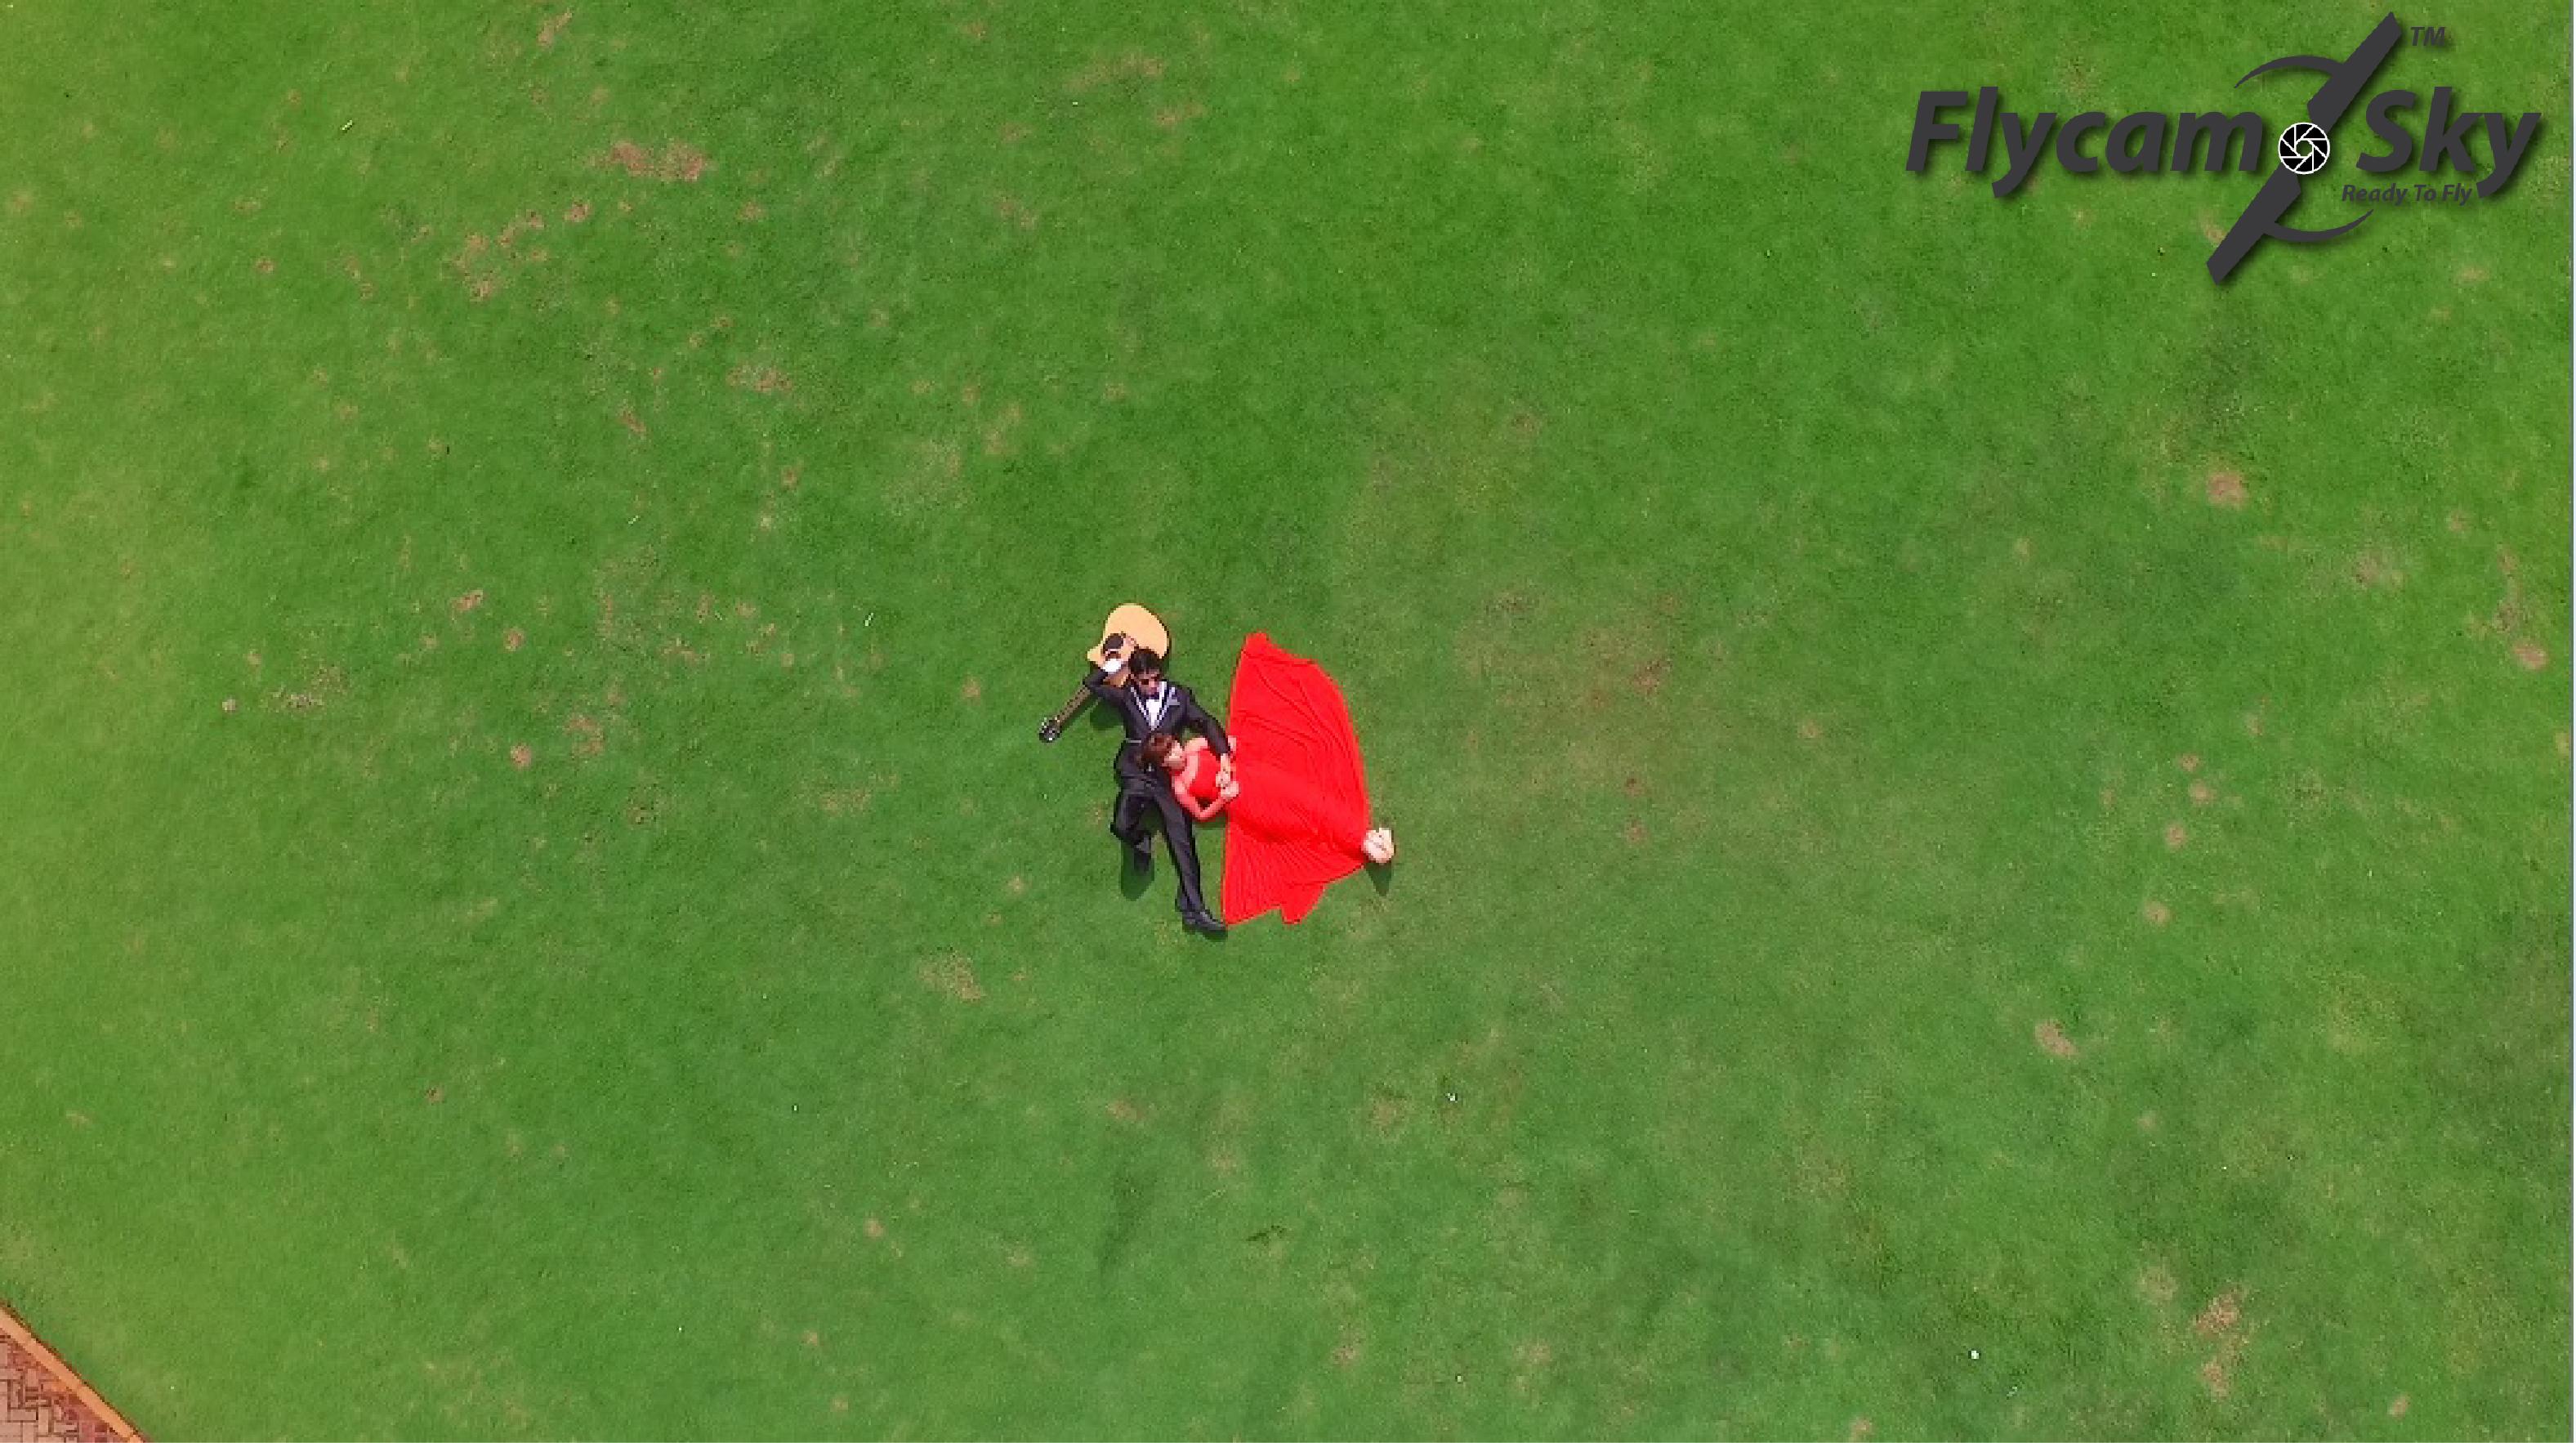 flycam quay cưới